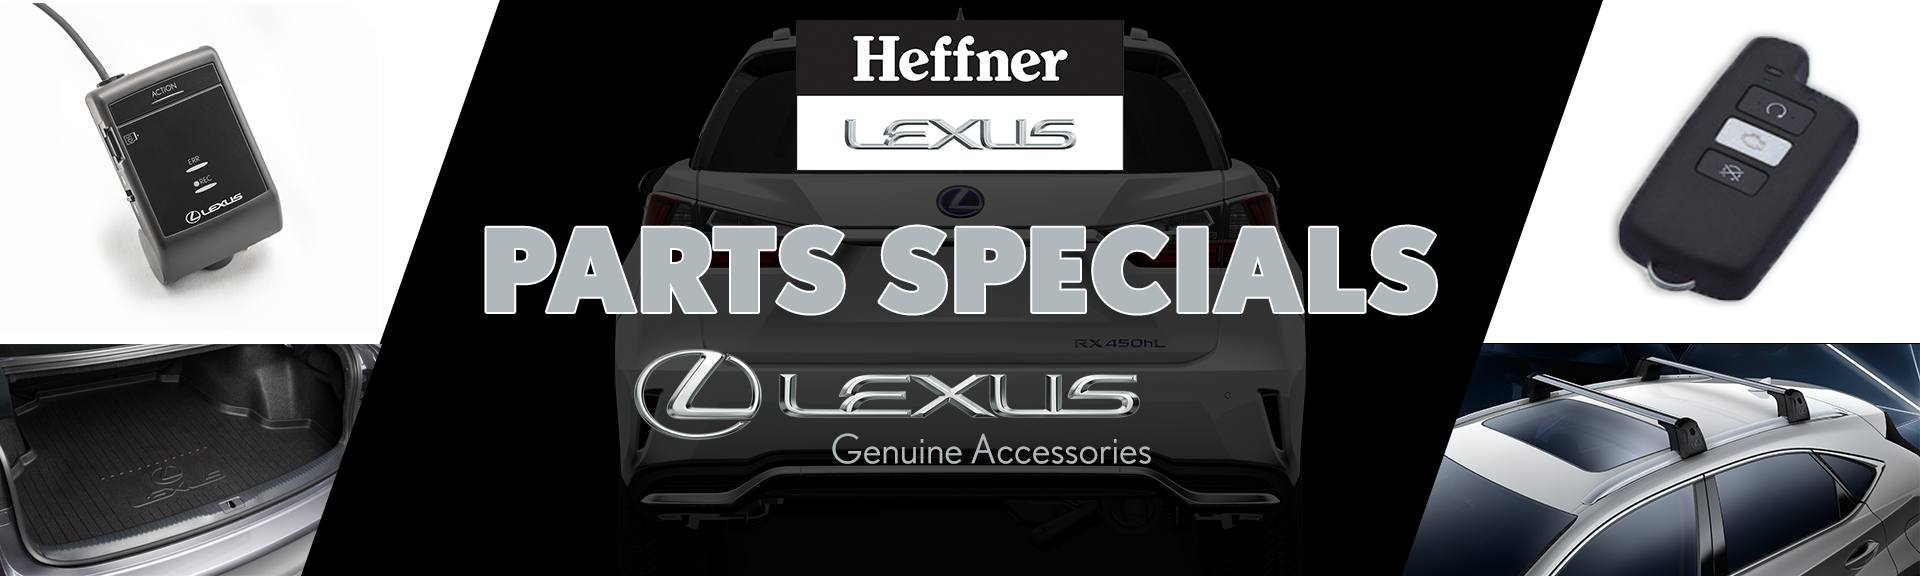 Heffner Lexus Parts Specials Page